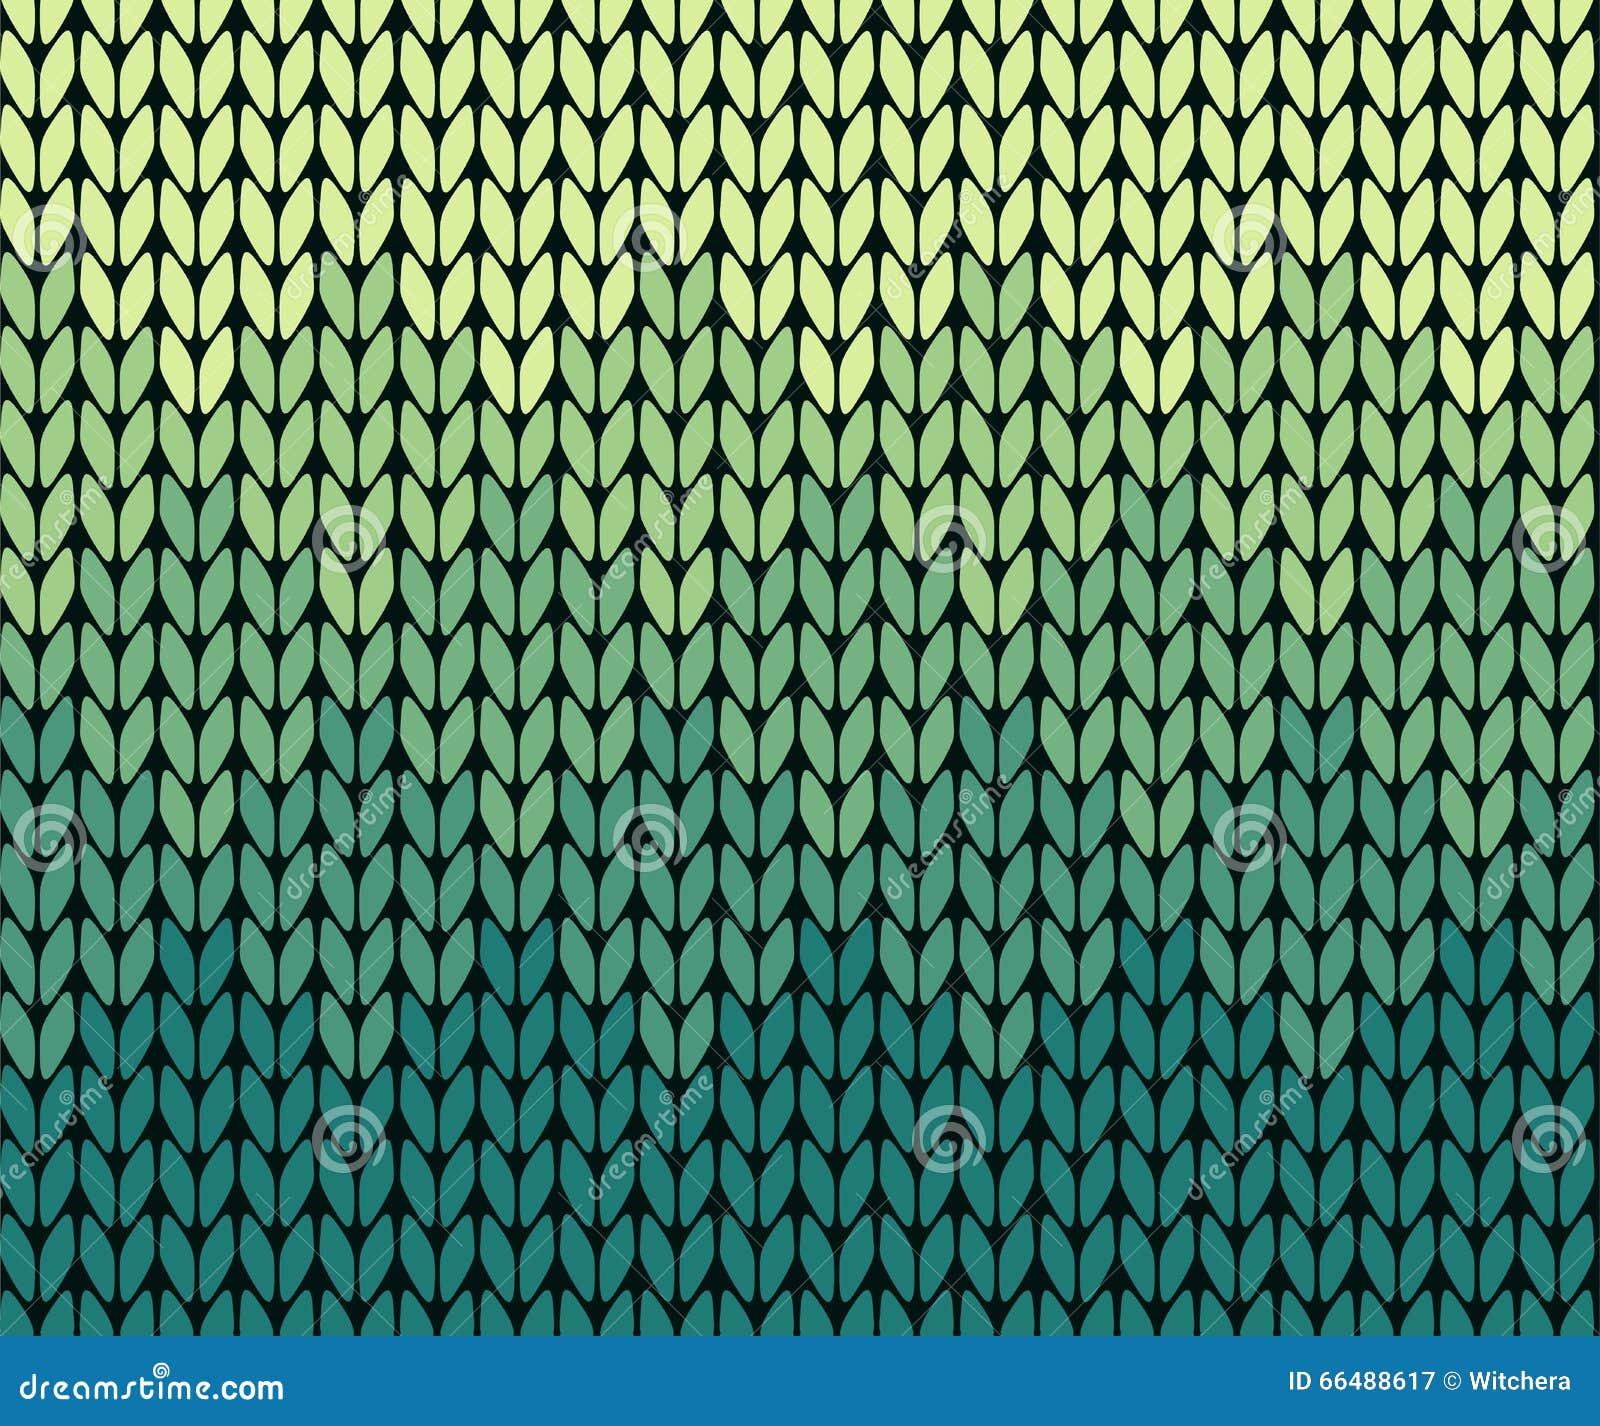 seamless gradient knitting pattern stock vector